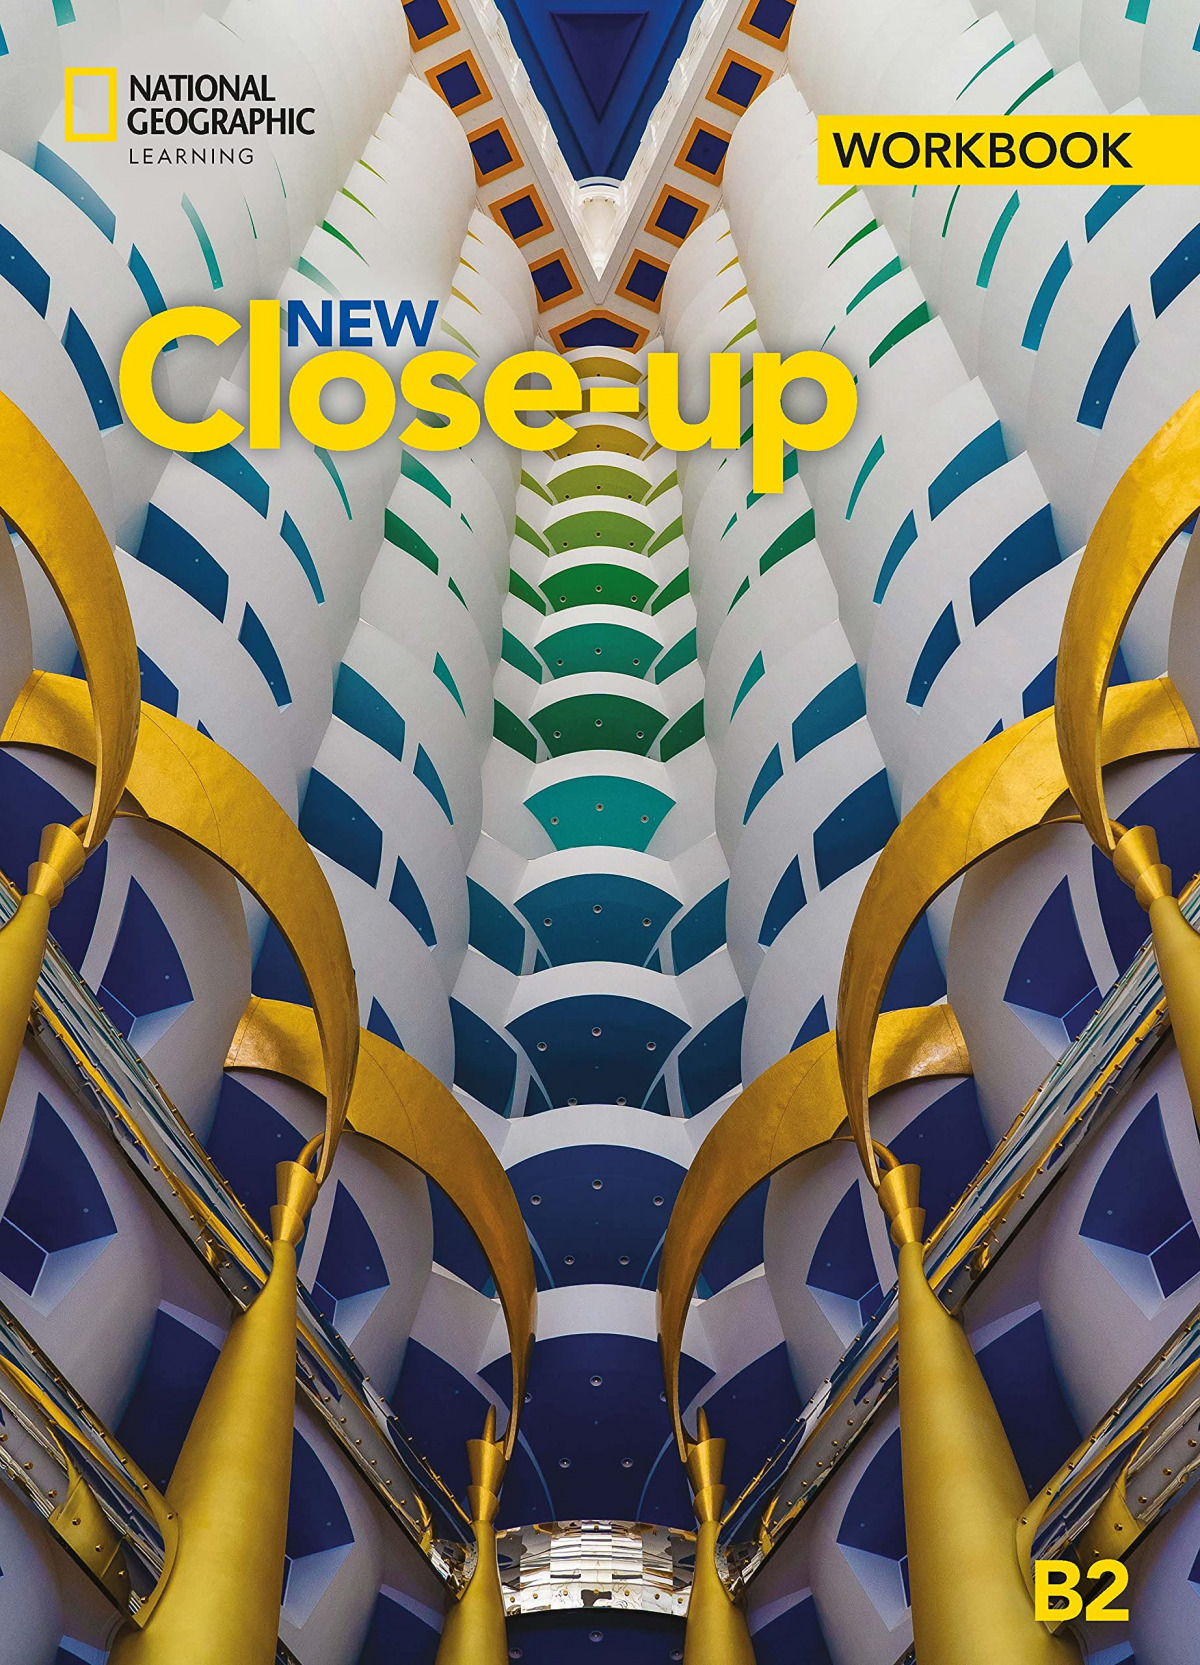 NEW CLOSE-UP B2 WORKBOOK